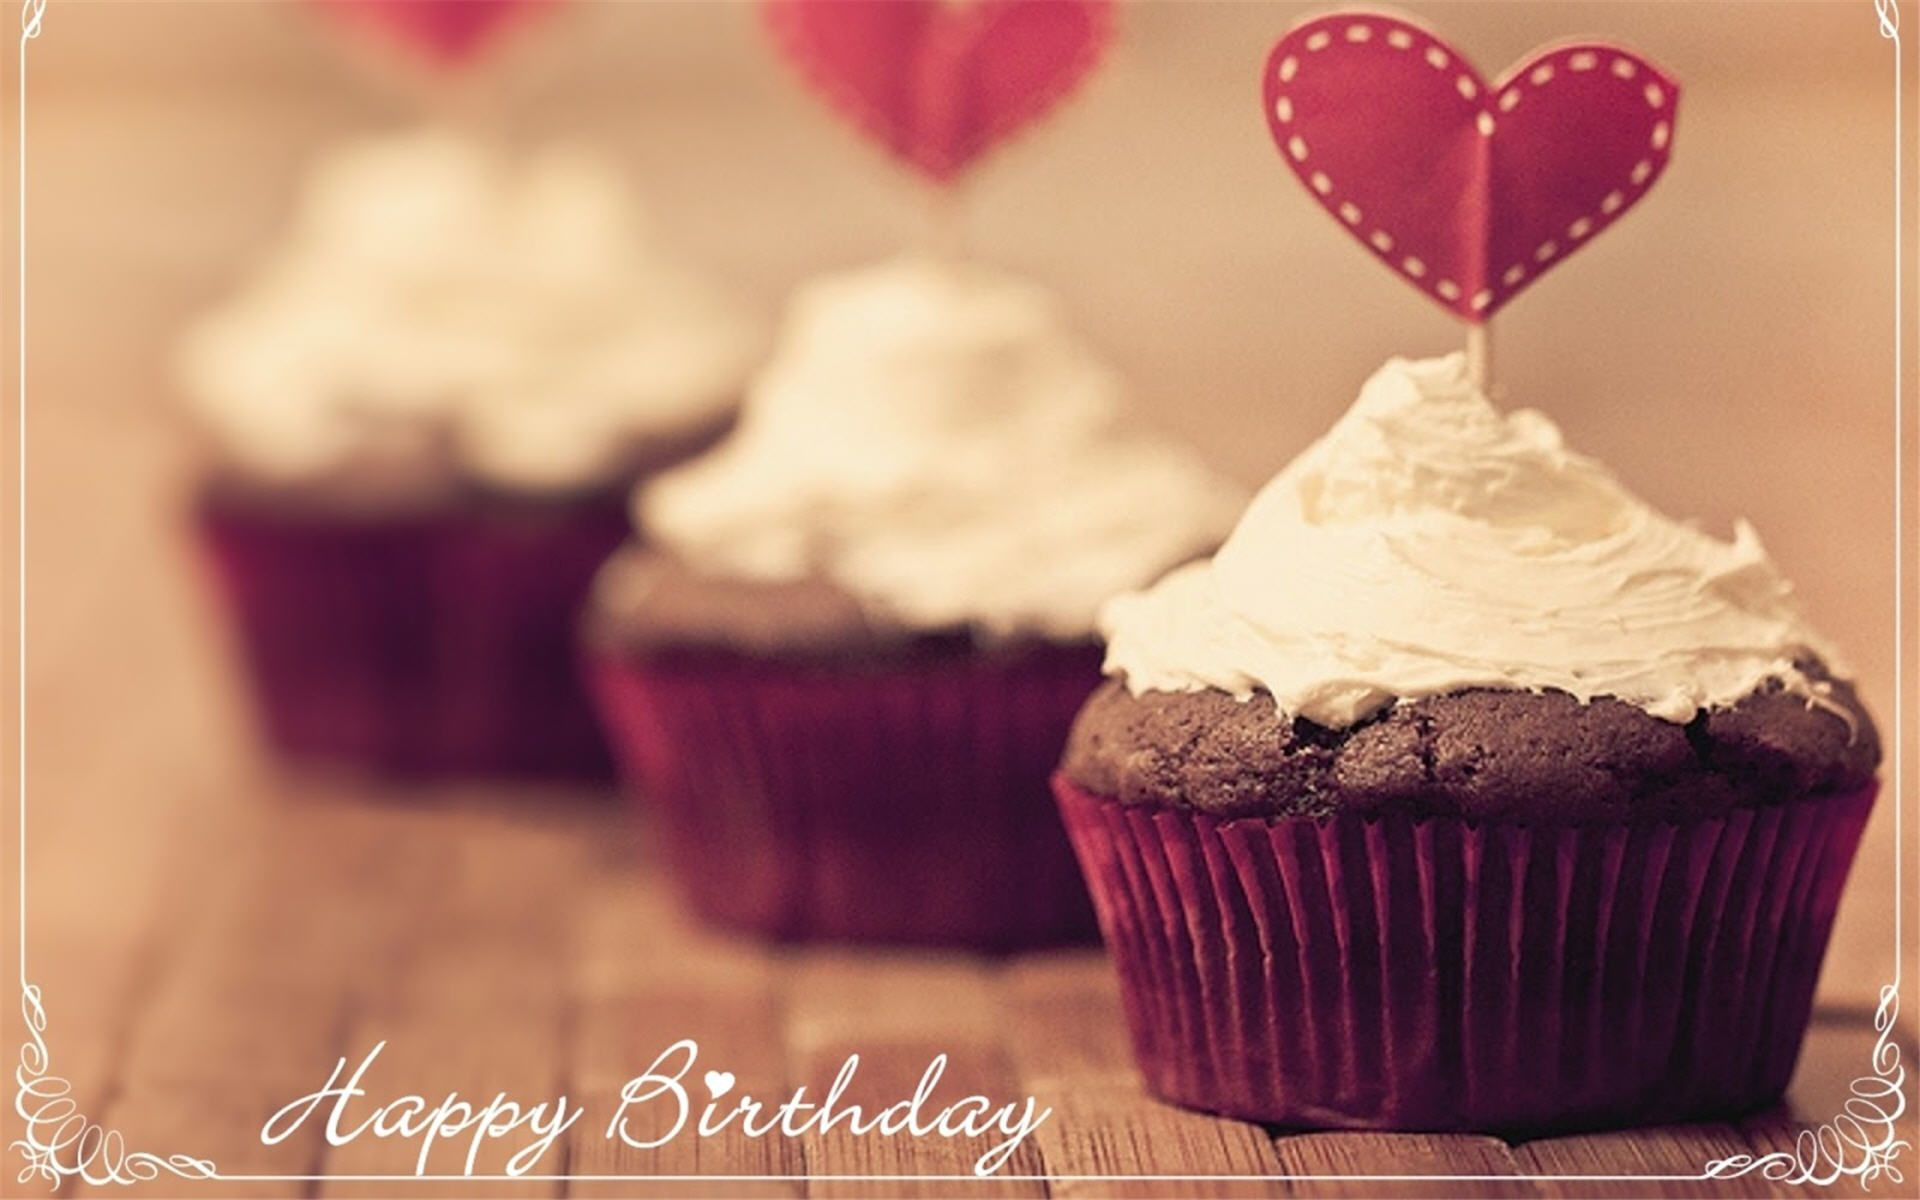 Happy Birthday Wishes HD Wallpaper Happy Birthday Wishes Quote - Birthday cake wishes quotes